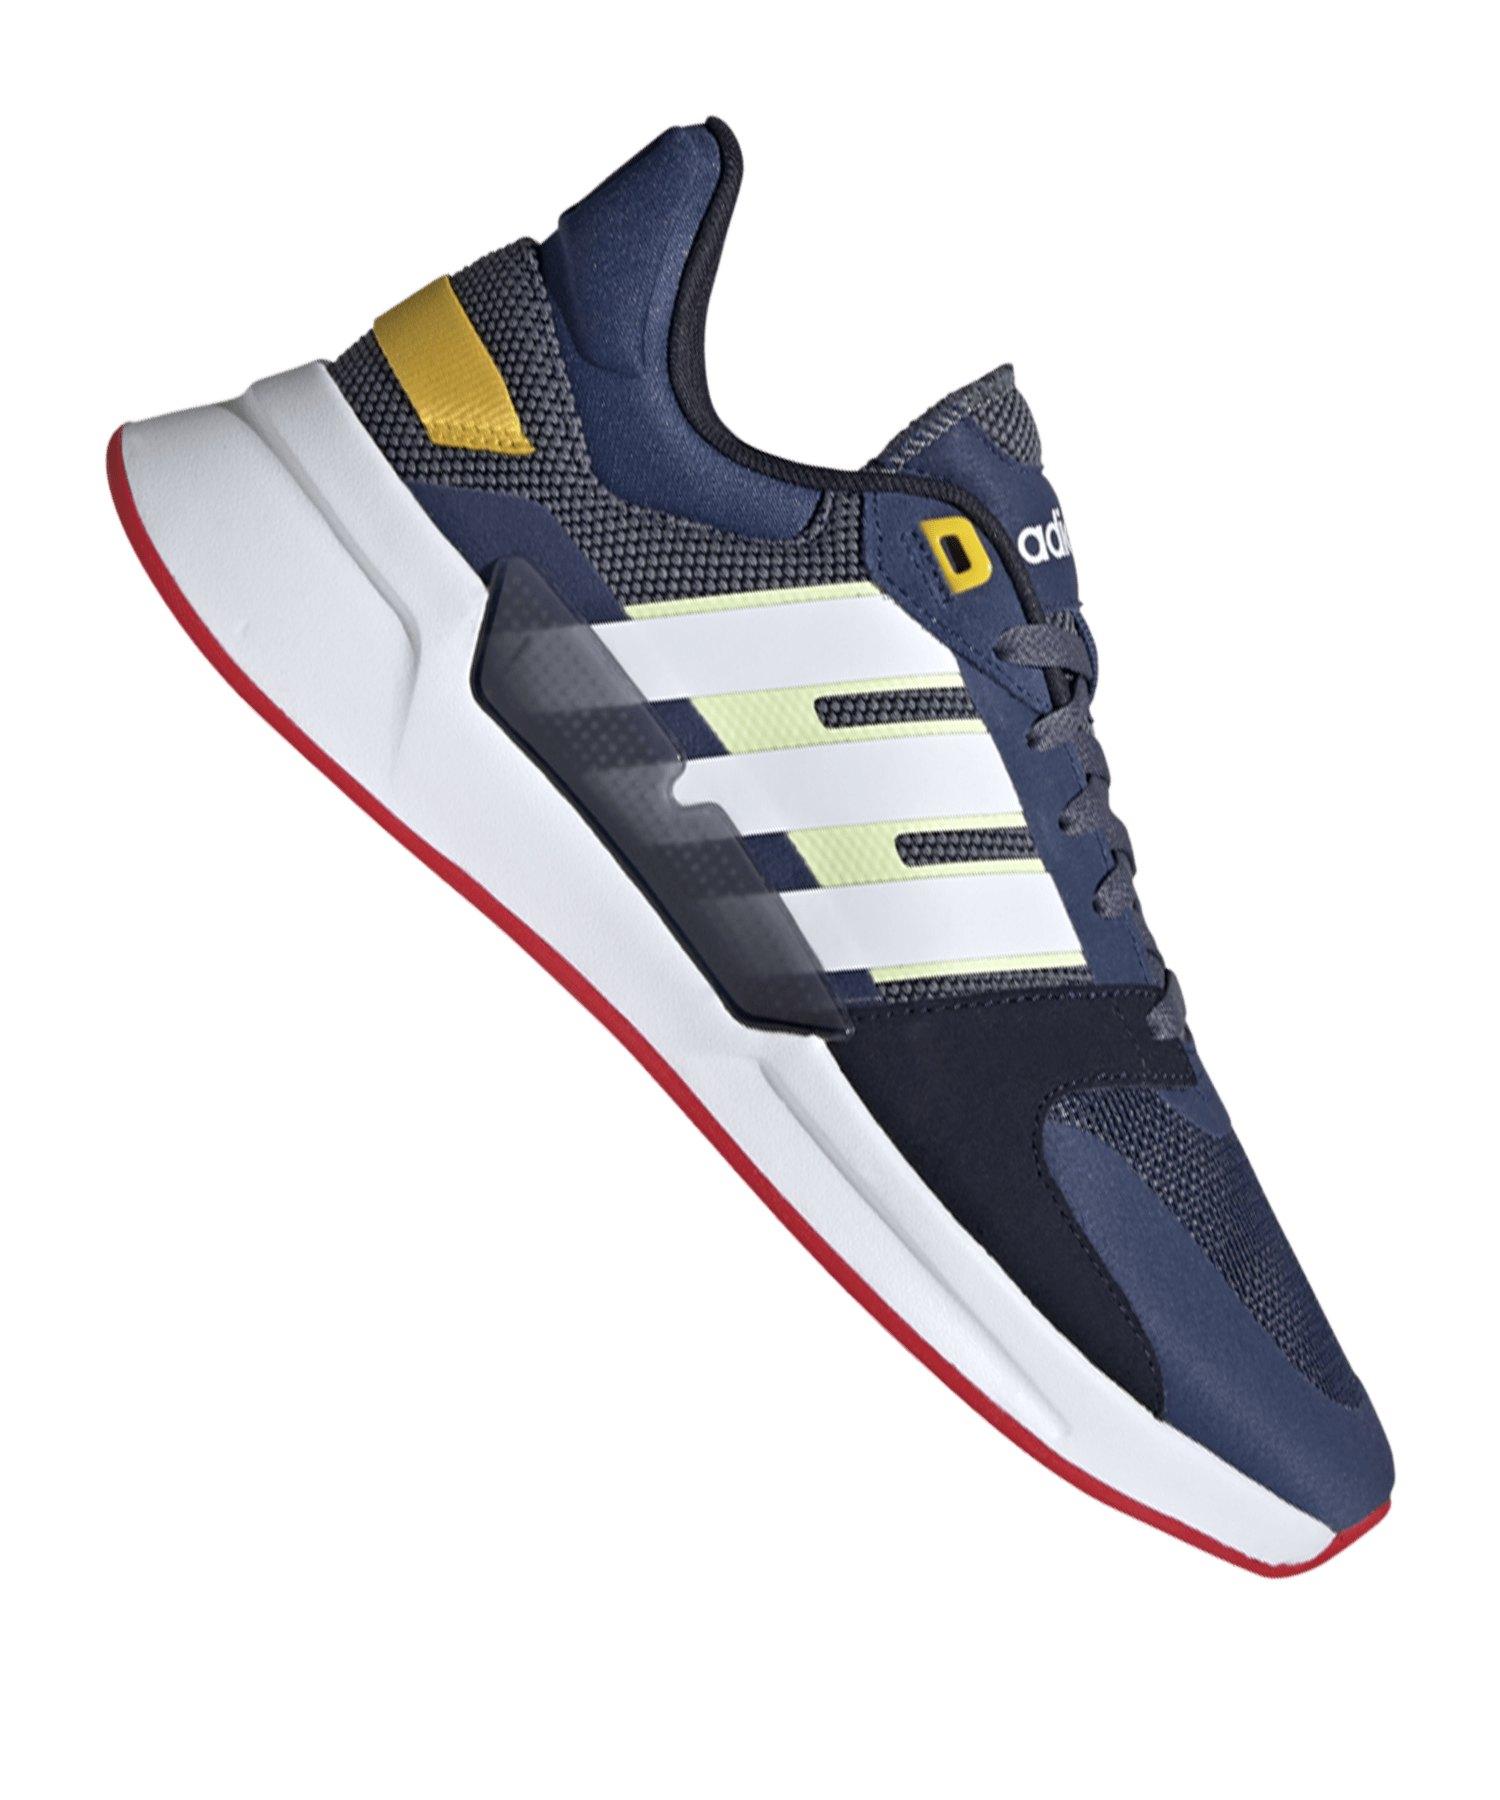 Adidas Run90s Sneaker Blau Weiss Streetstyle Freizeit Street